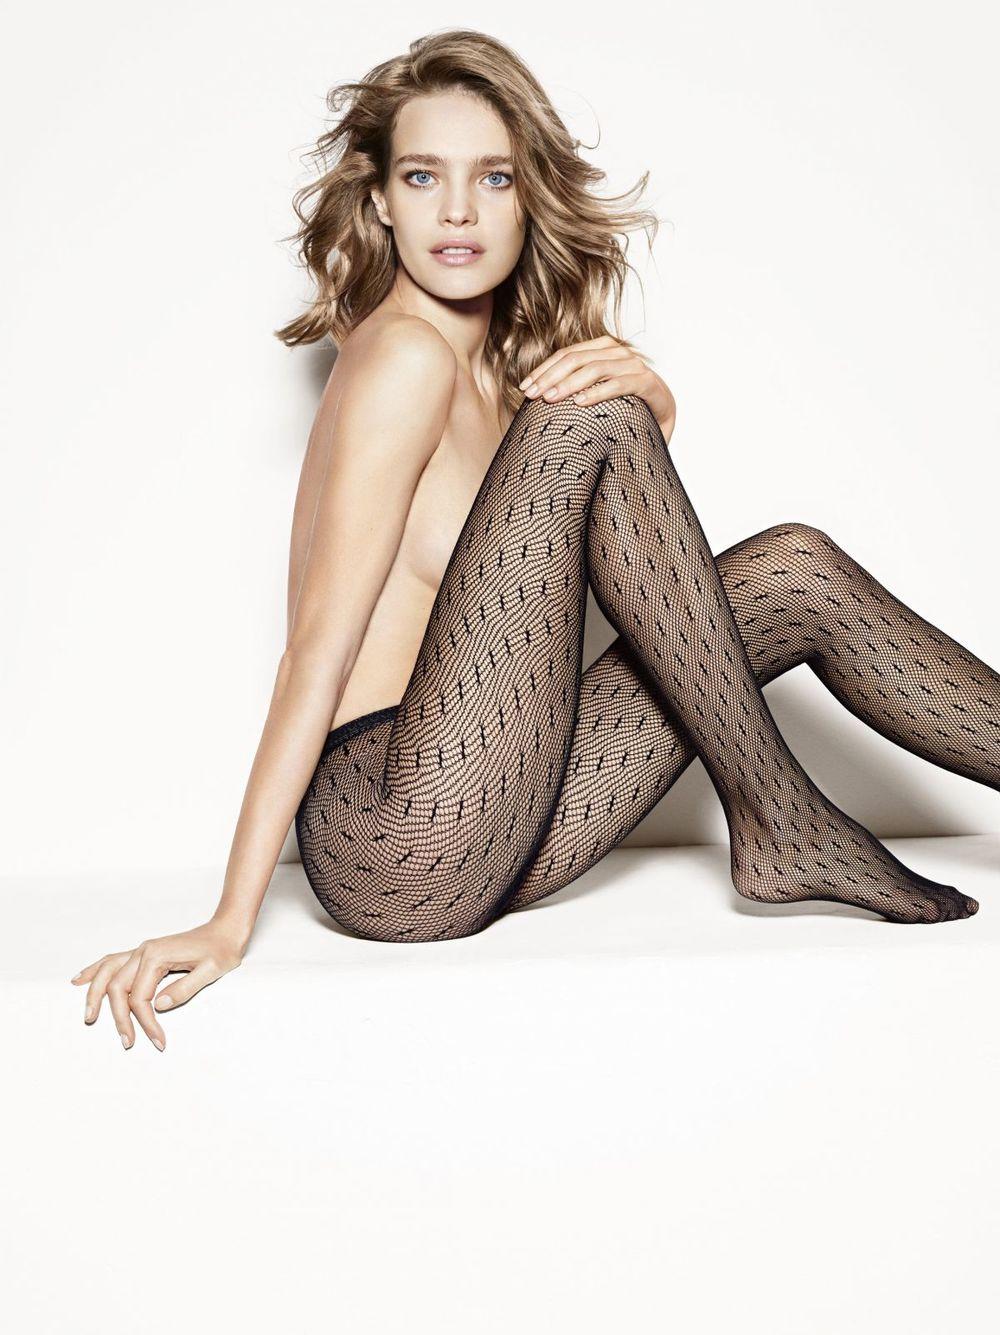 natalia-vodianova-etam-lingerie-spring-summer-2014-collection_2.jpg